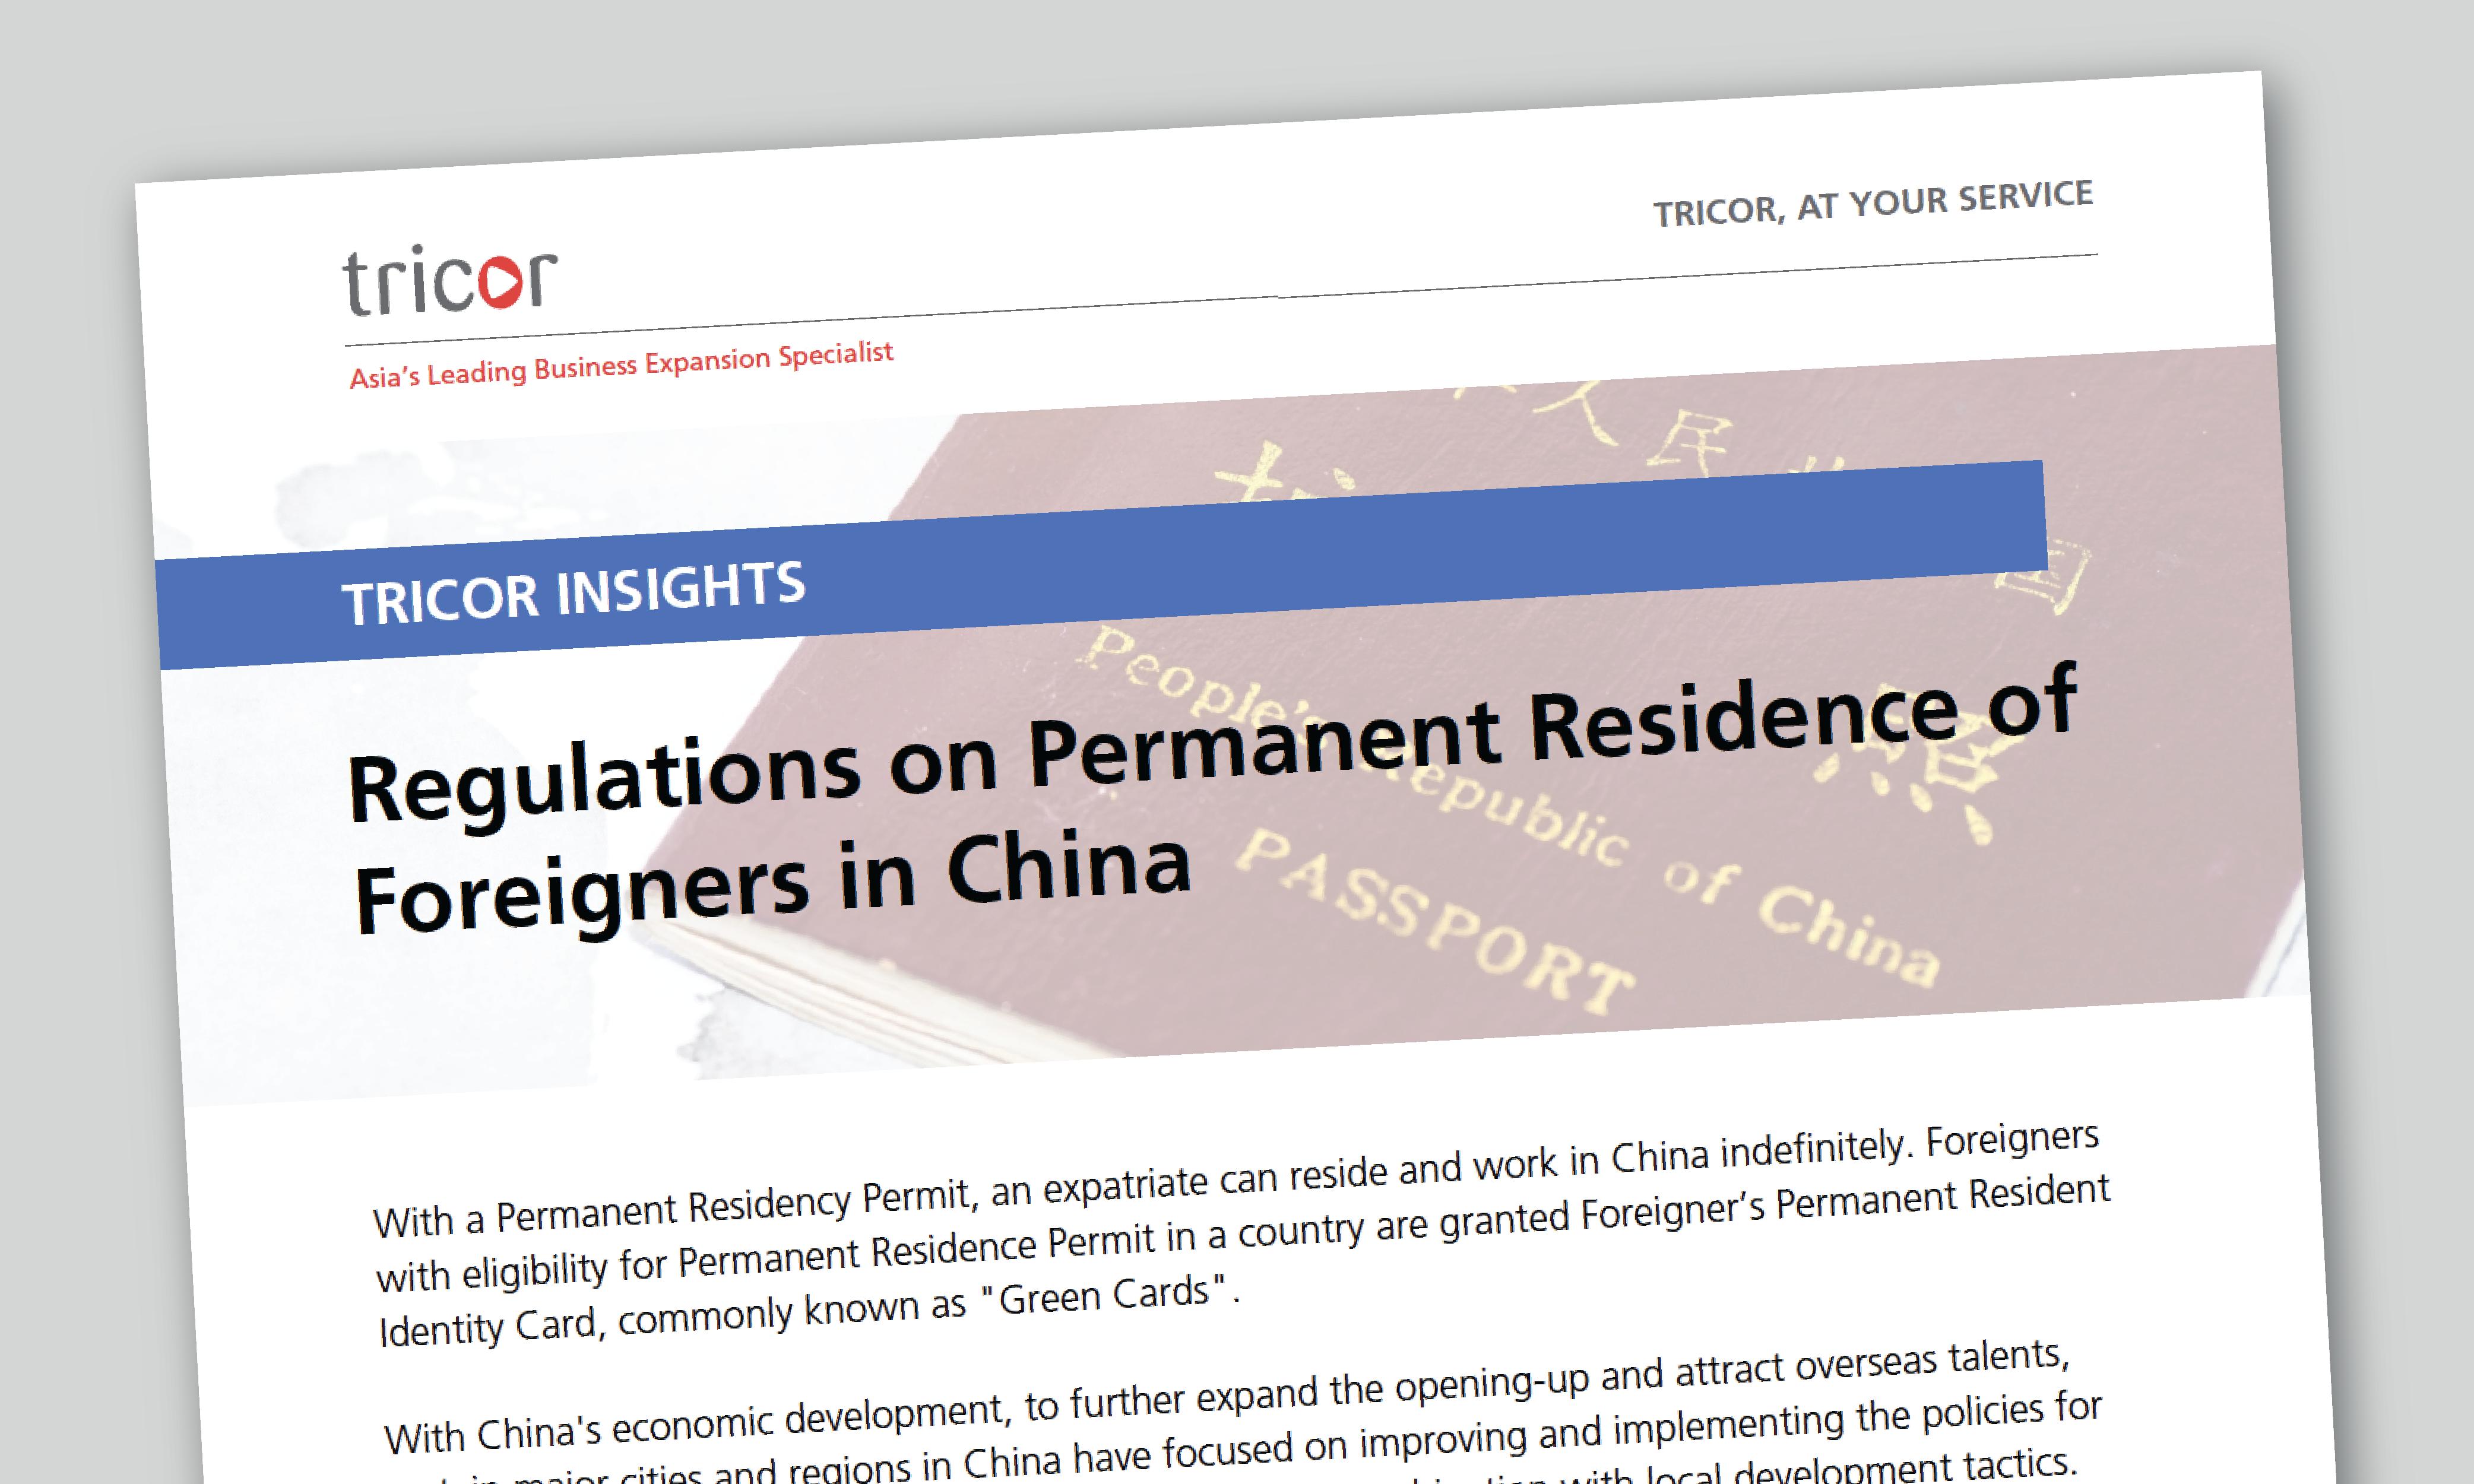 cn-resident-foreigner-permit-blog-images-01